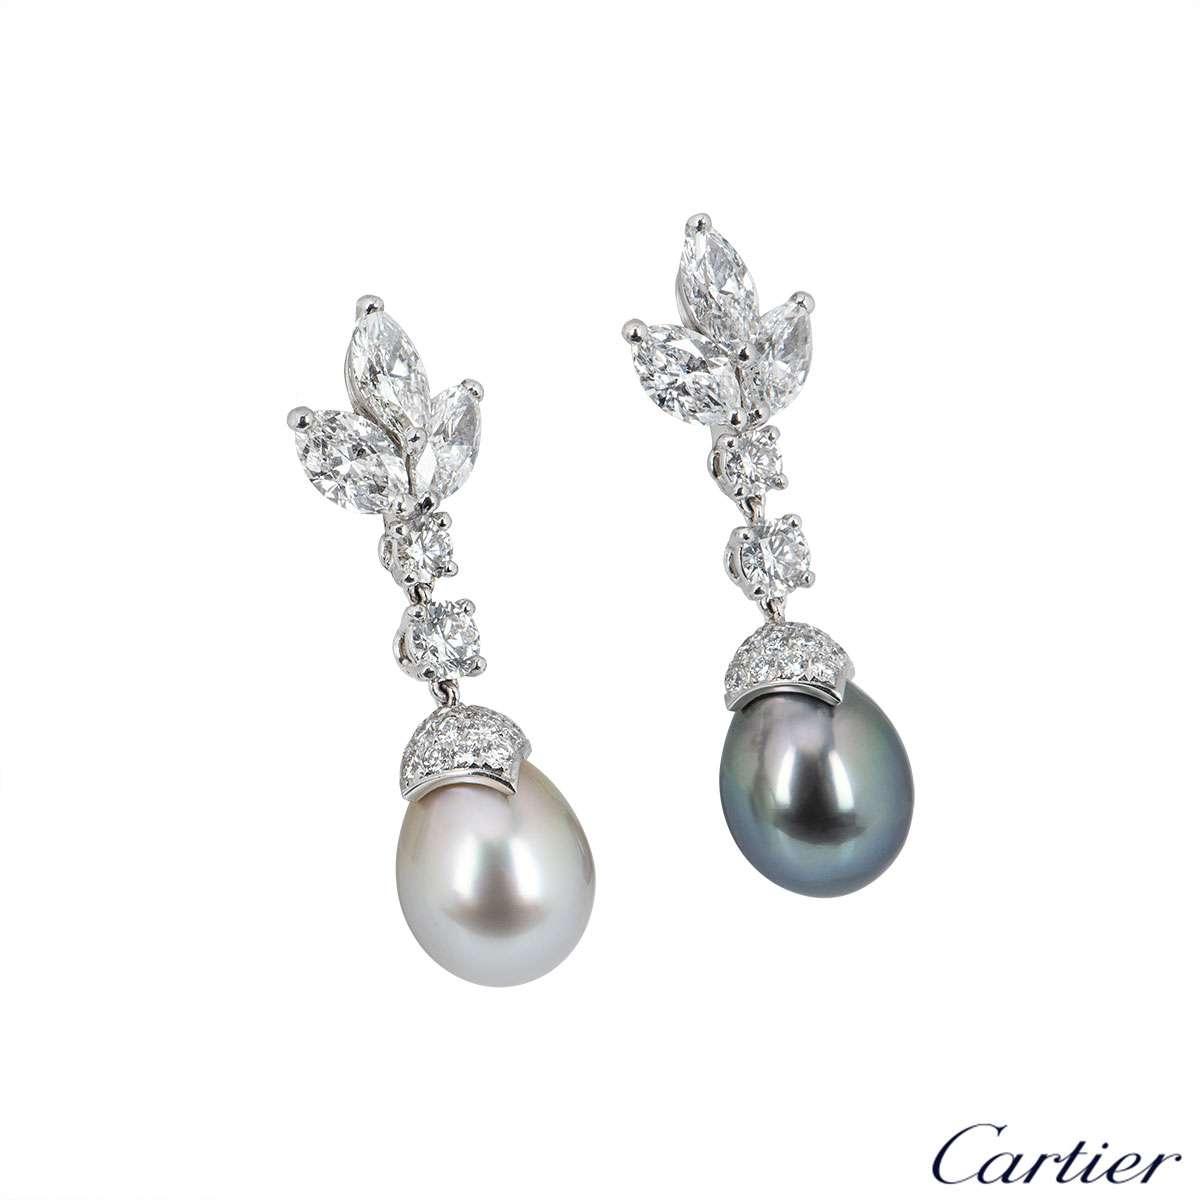 Cartier Platinum Cartier de Lune Diamond & Pearl Earrings HP800116